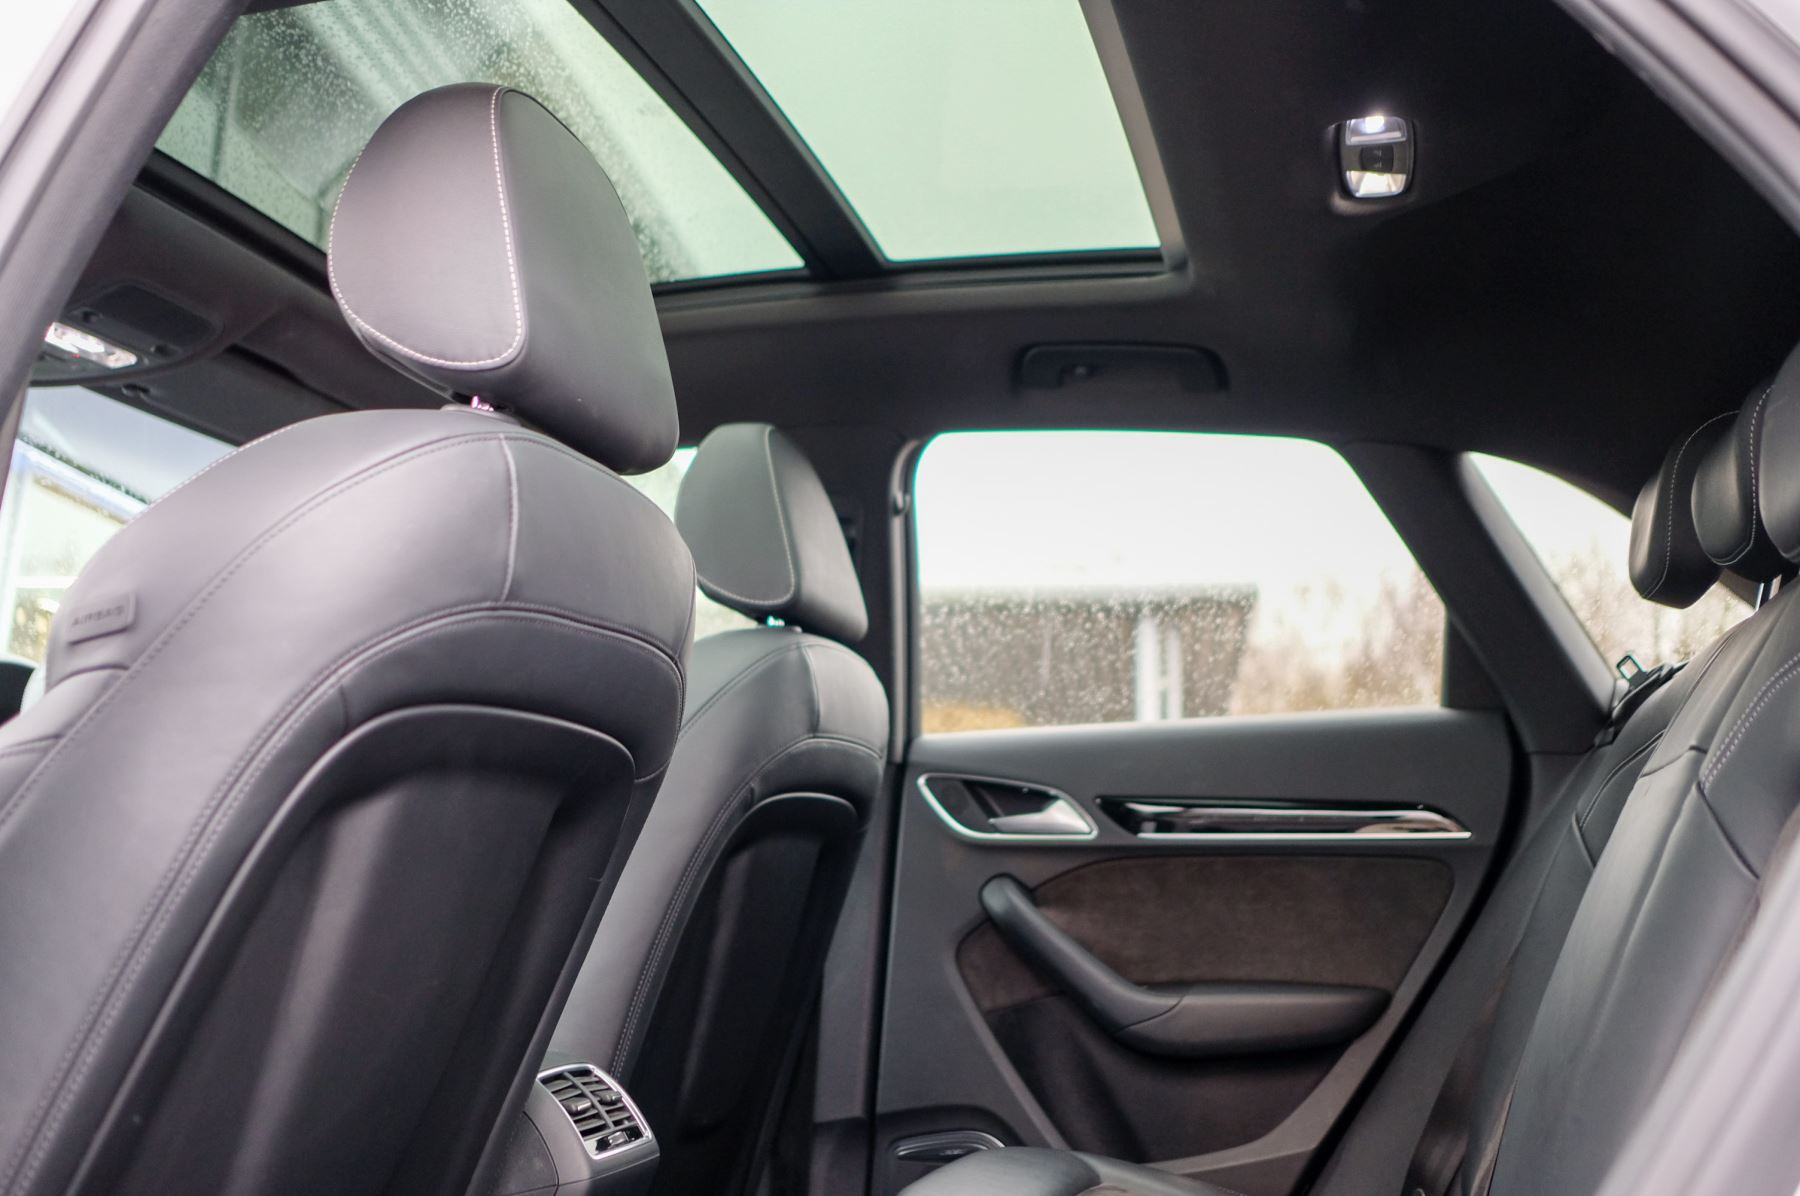 Audi Q3 2.0T FSI Quattro Black Edition 5dr S Tronic - Panoramic glass sunroof image 18